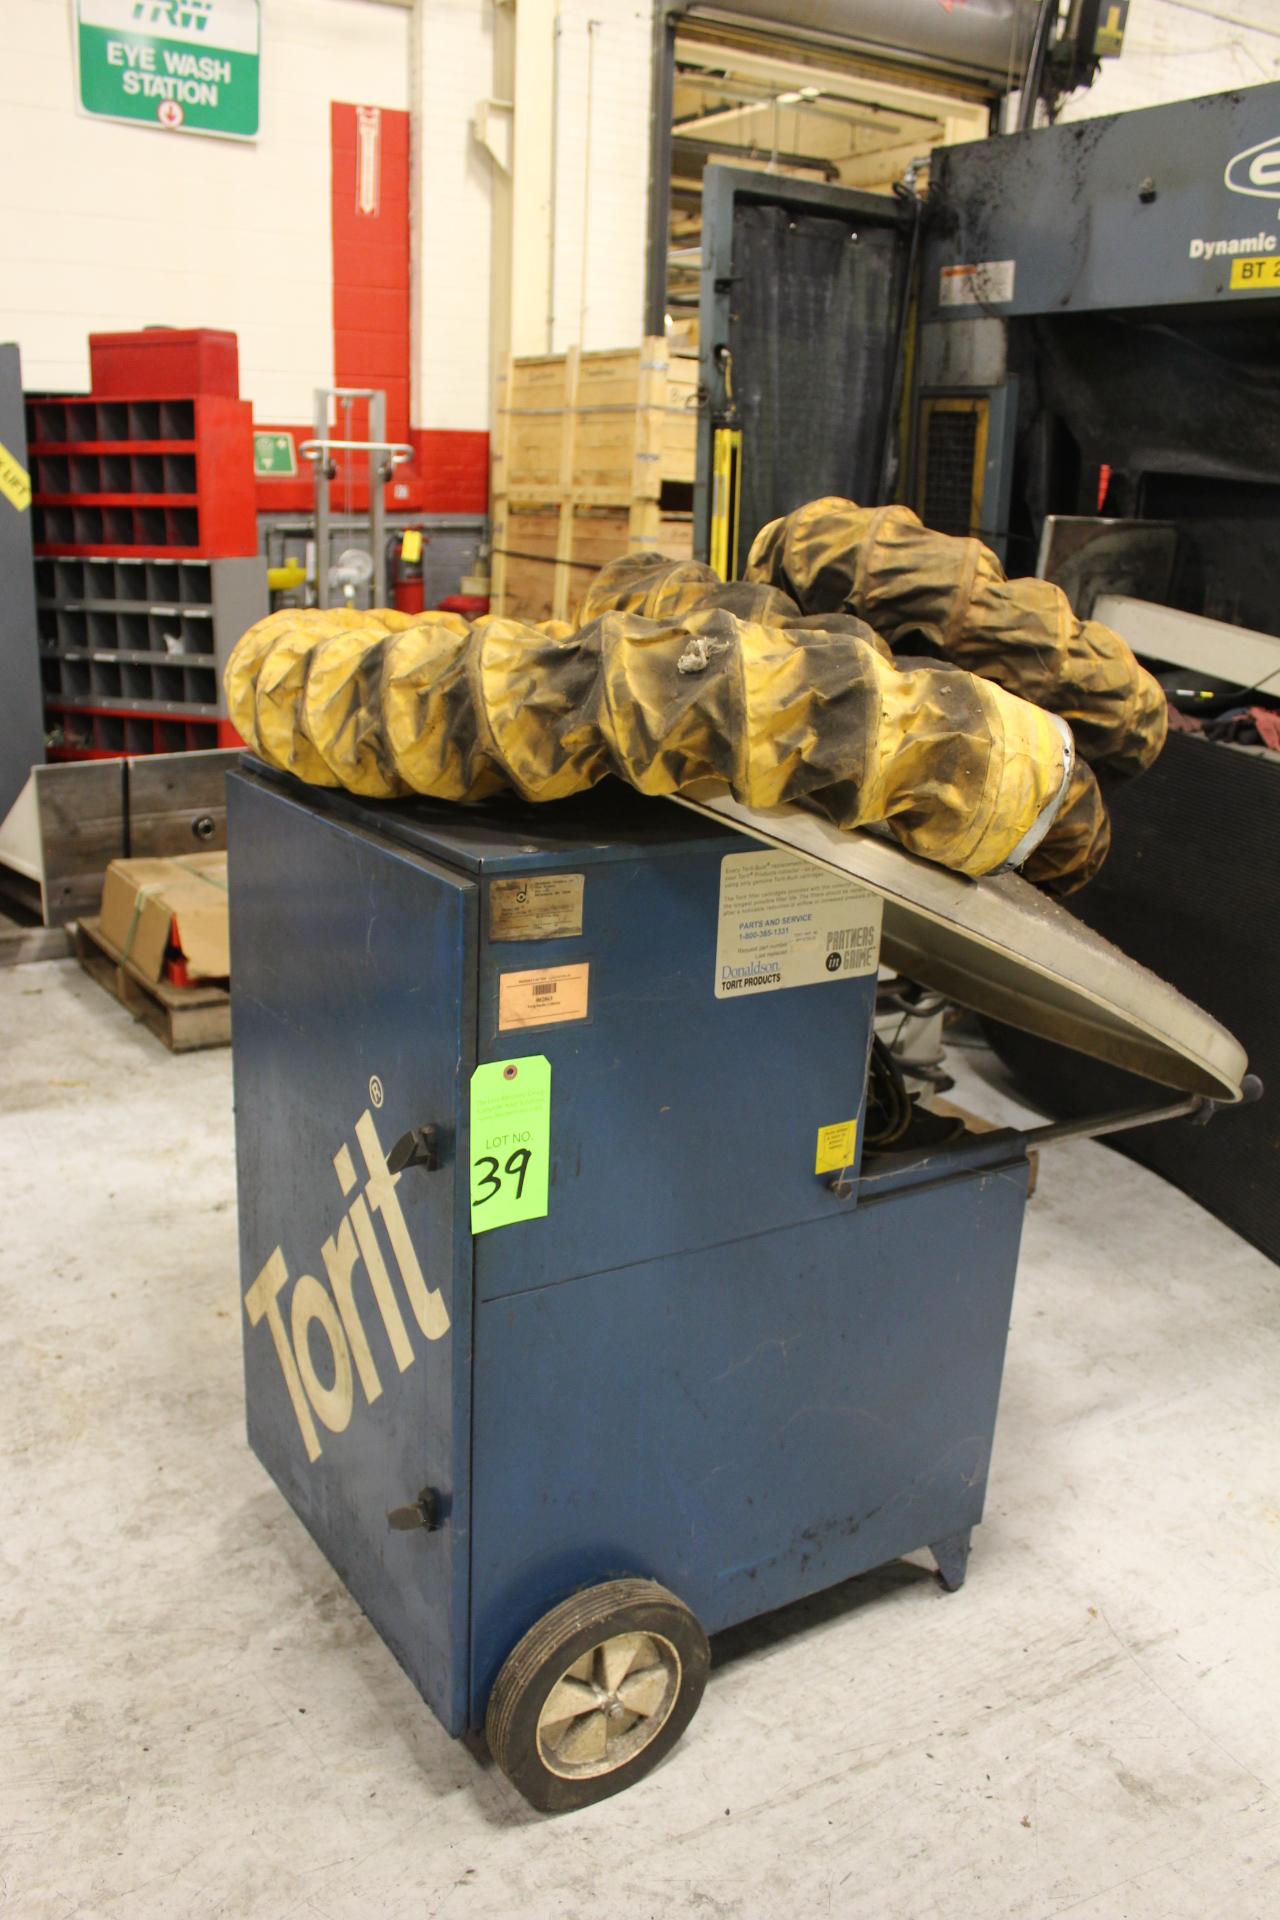 Lot 39 - Torit Trunk Line Porta-Trunk Portable Fume Exhaust Unit